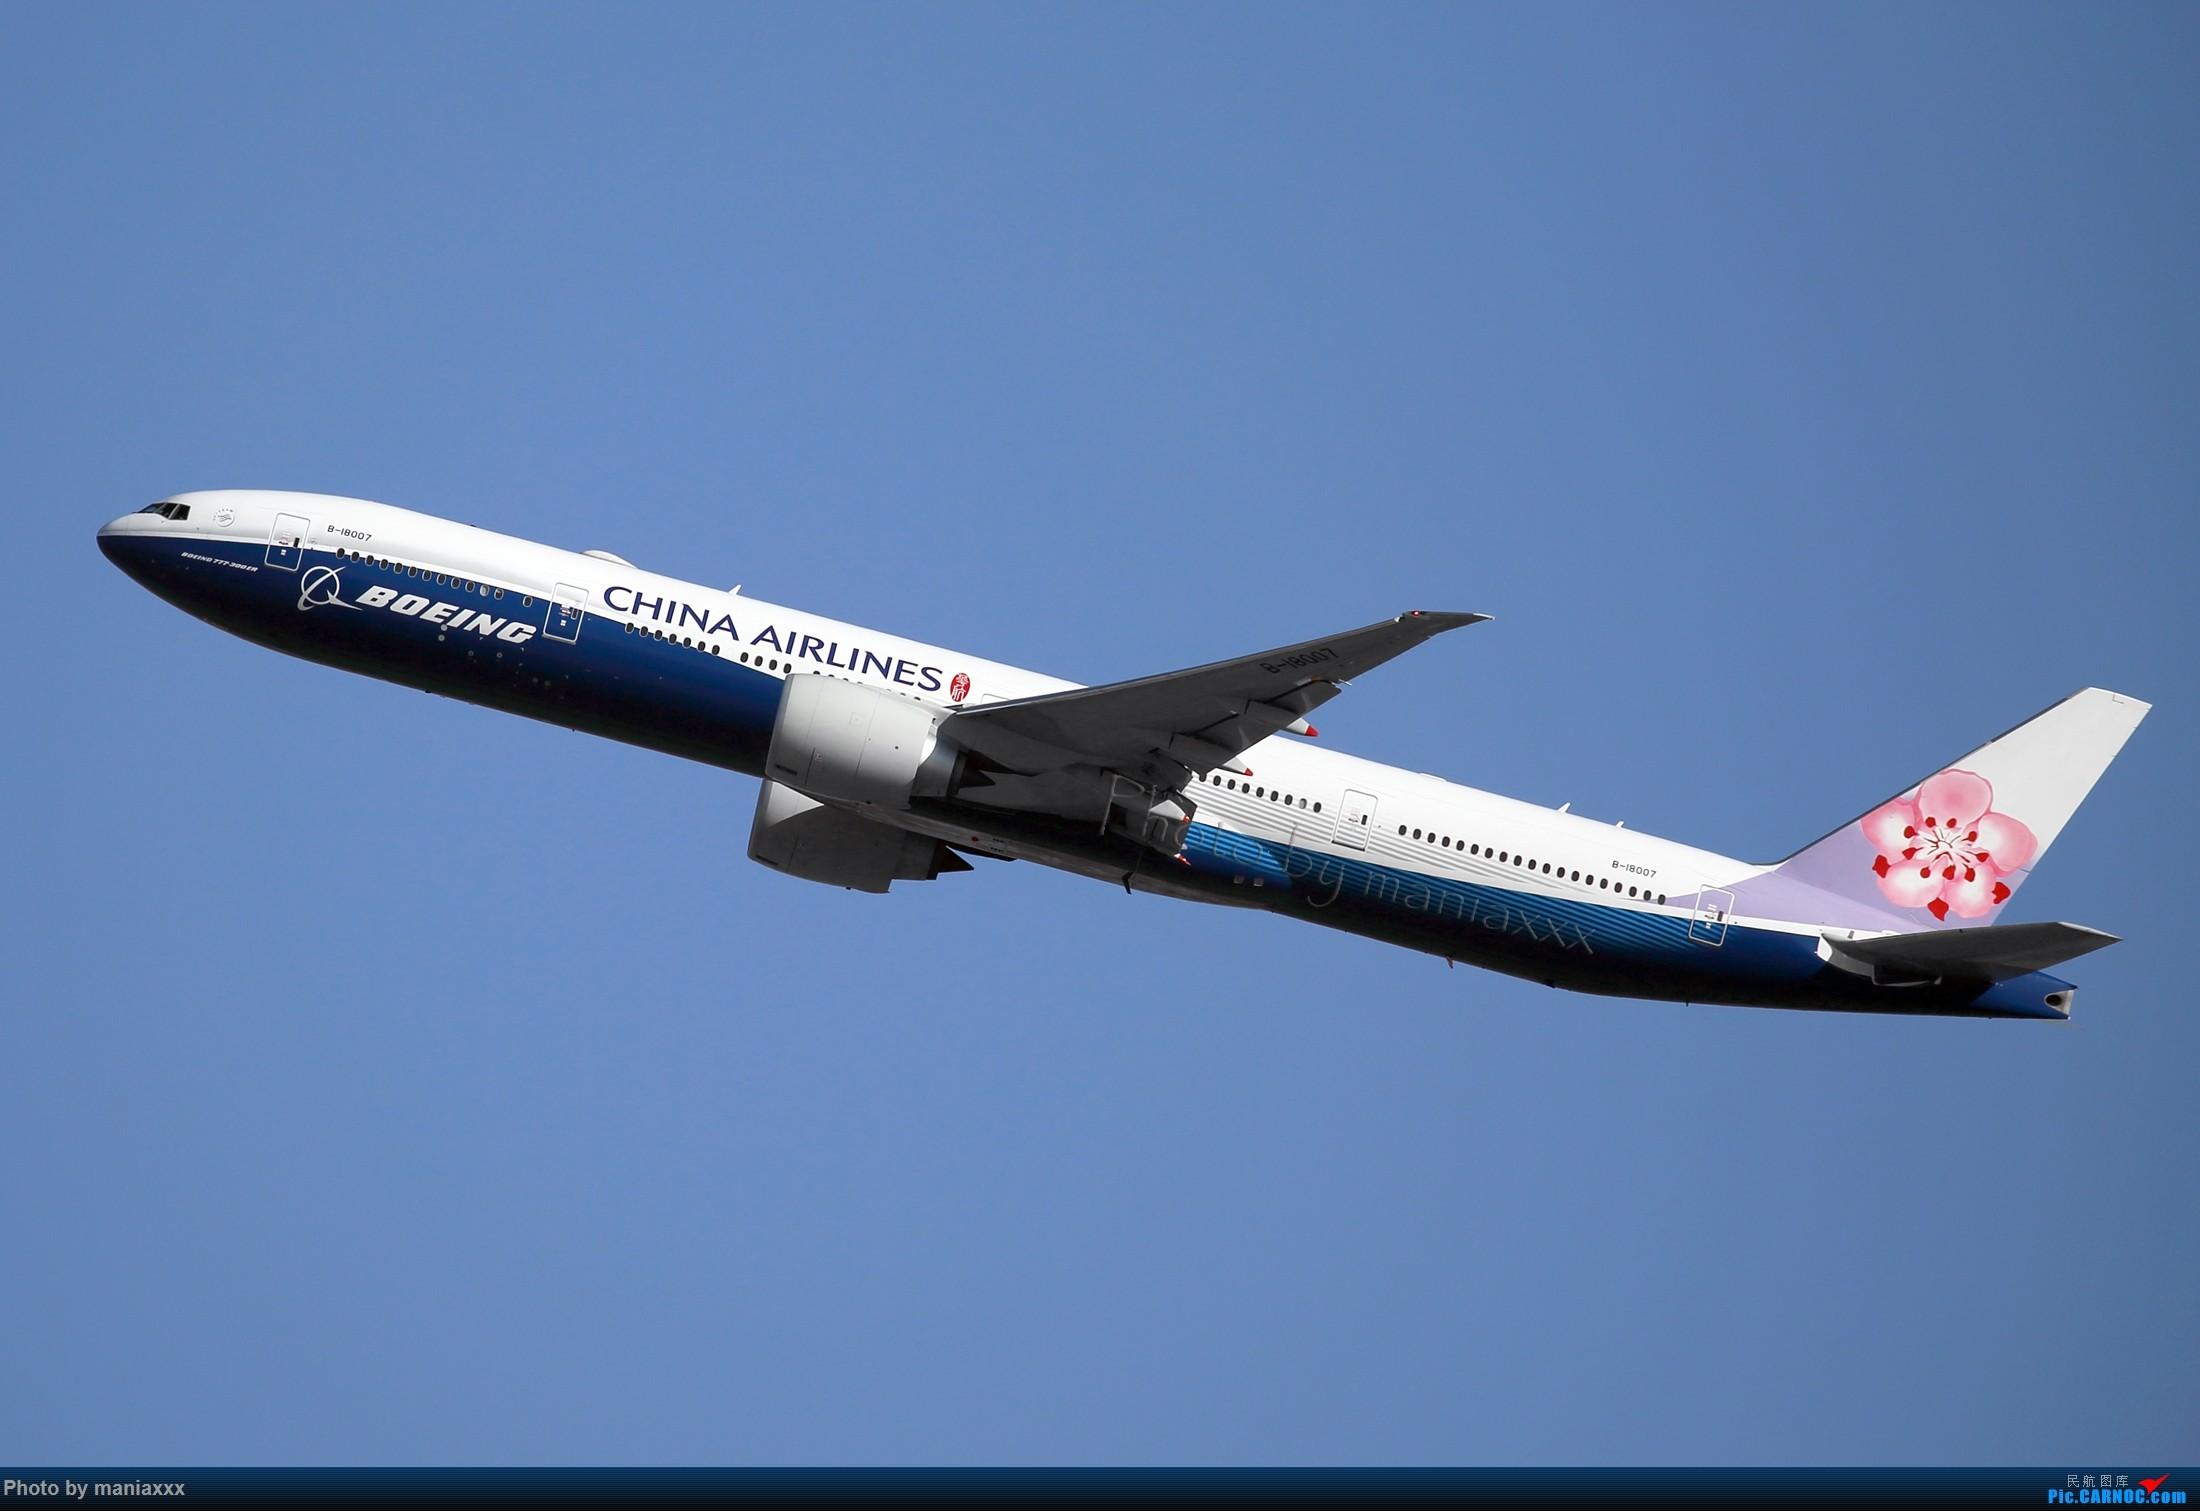 Re:[原创]得来不易的迎来送往~~~~华航蓝鲸~~~~~~ BOEING 777-300ER B-18007 中国北京首都国际机场